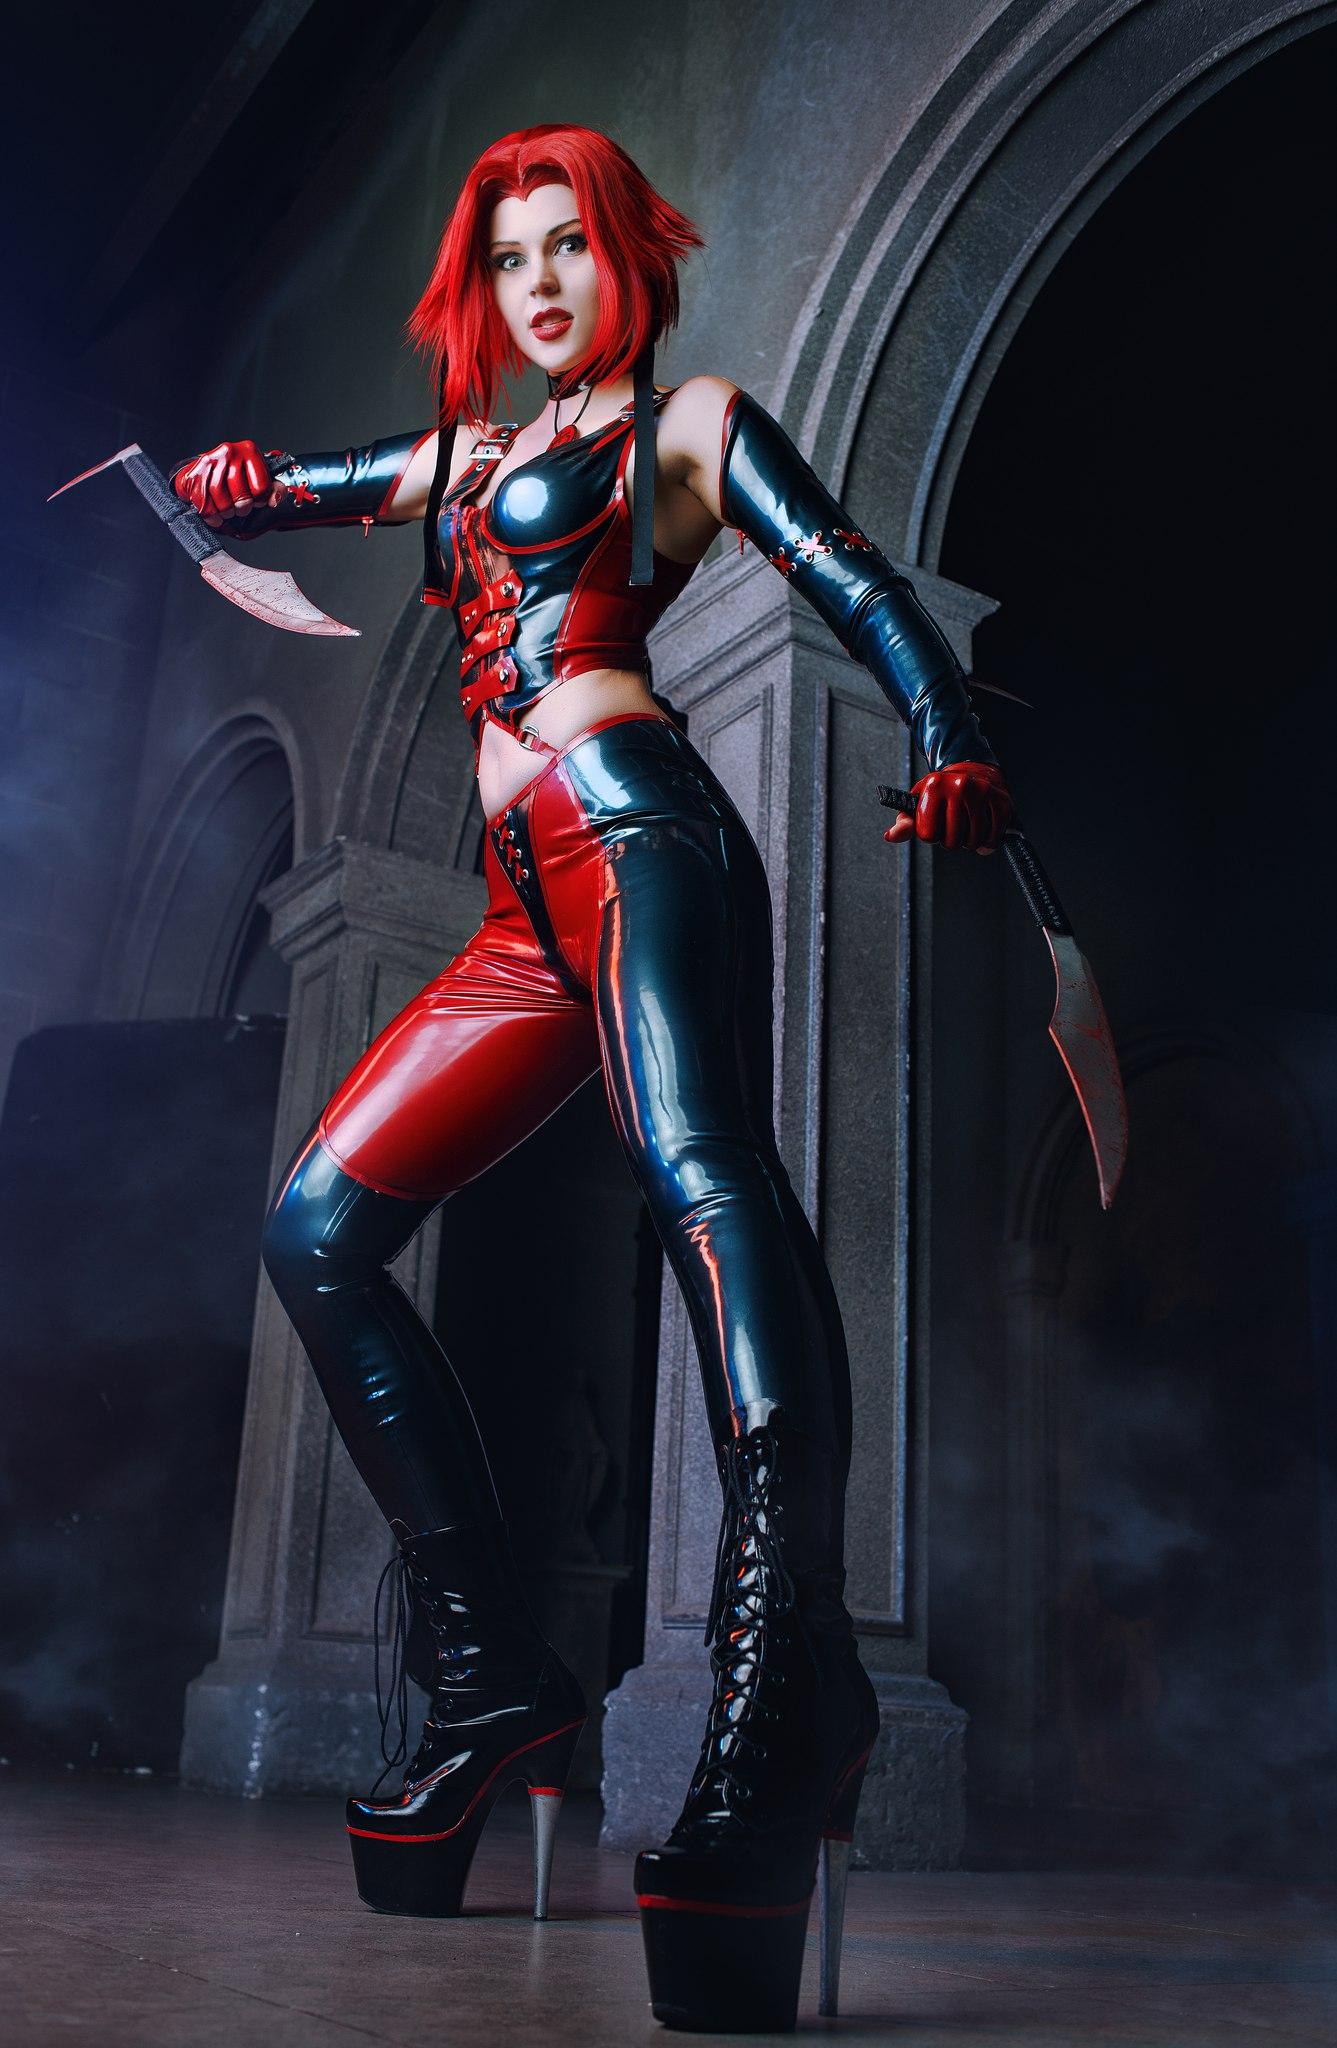 Blood rayne erotic pic